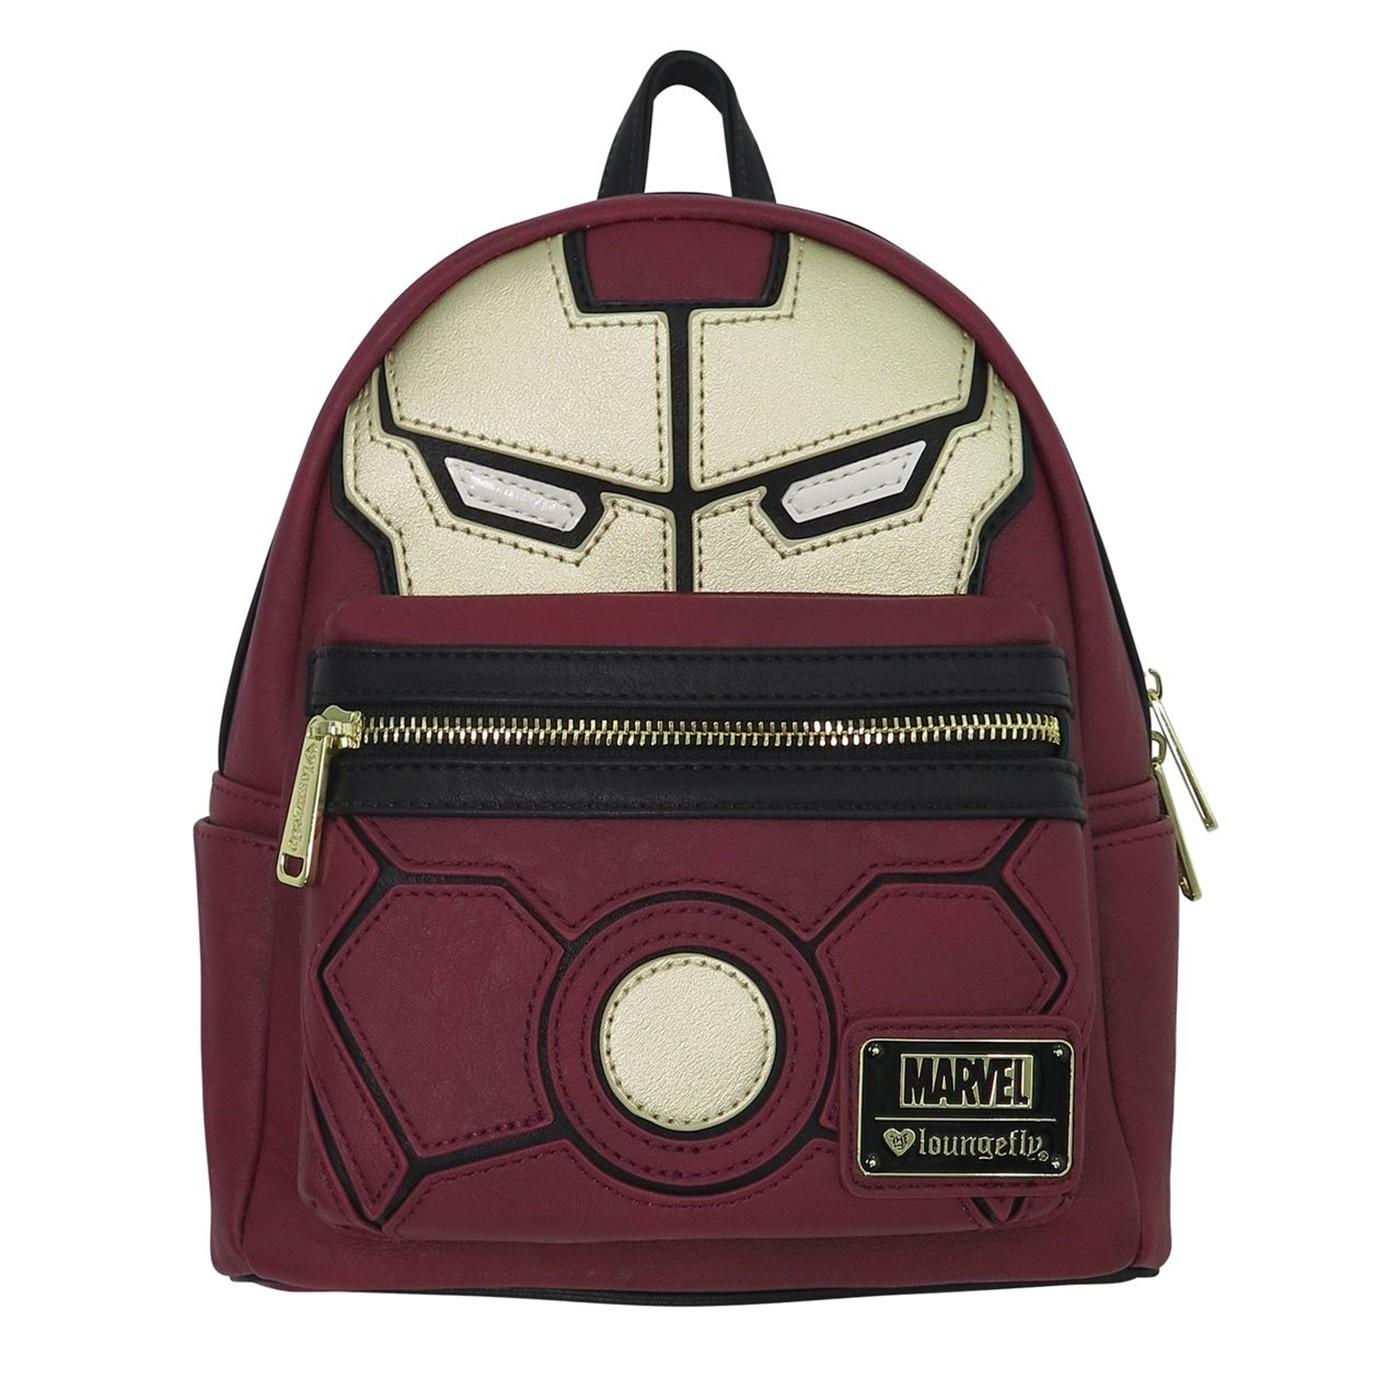 Avengers Infinity War Iron Man Loungefly Mini Backpack